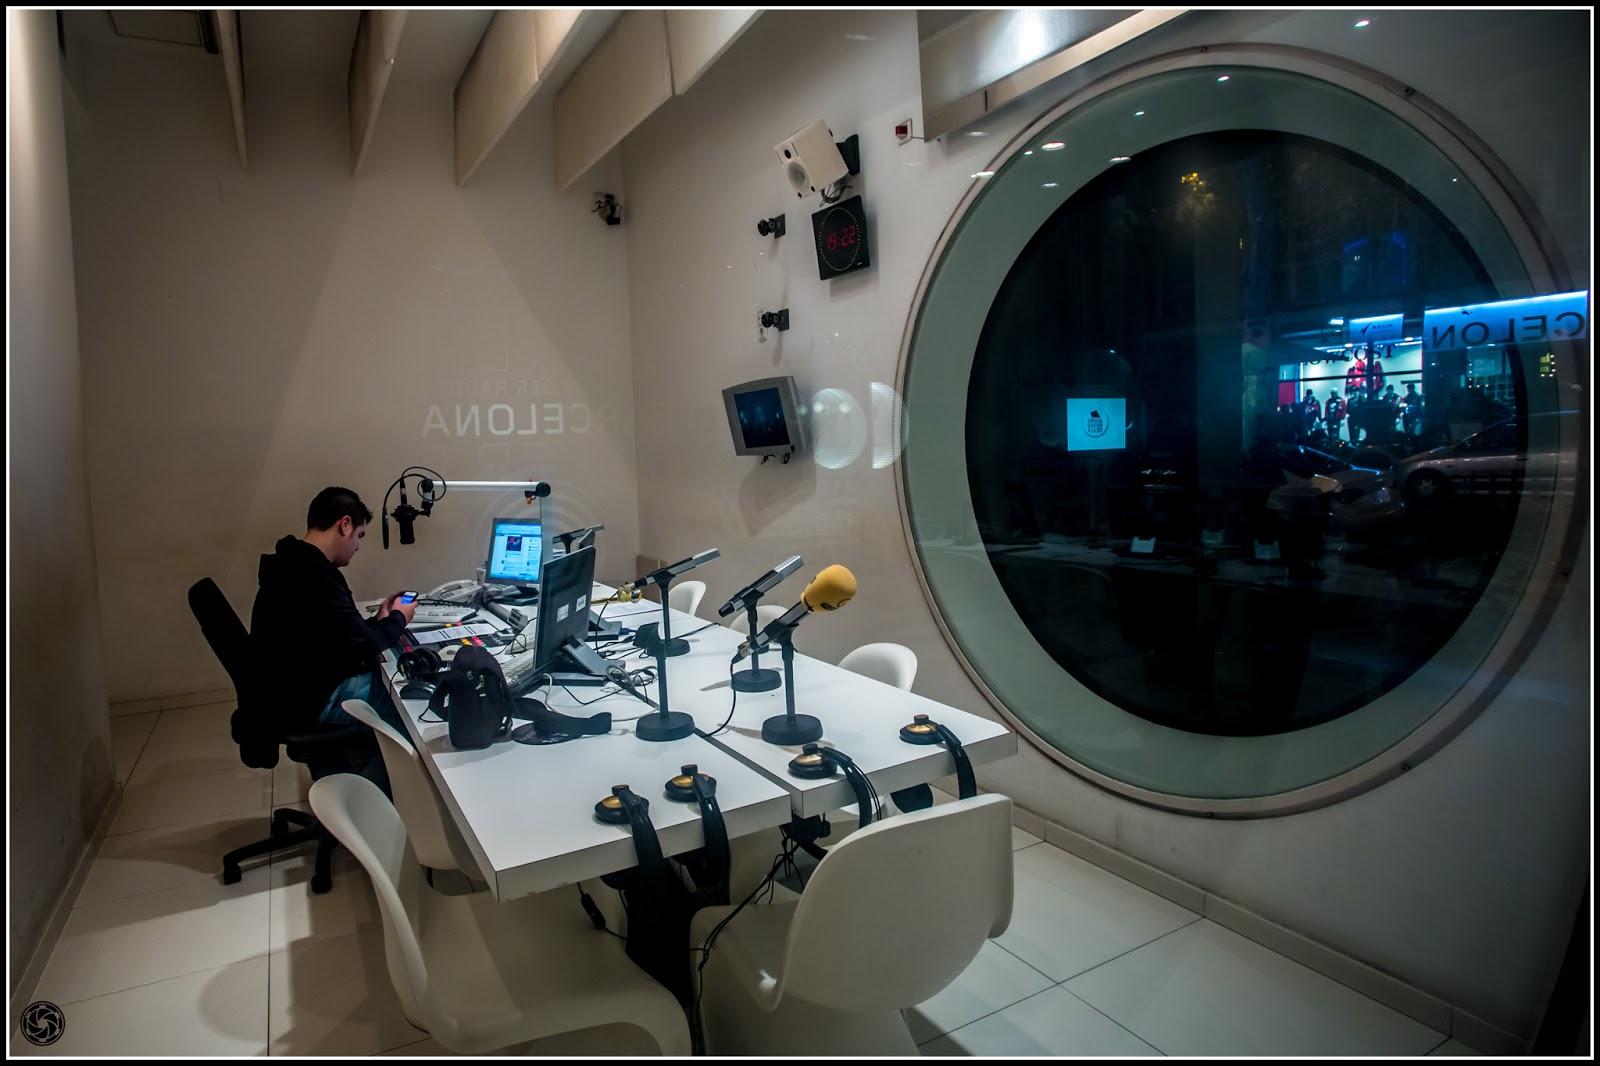 Radio Barcelona SER, en calle Caspe: Canon EOS 5D MkIII | ISO 800 | Canon 17-40@17mm | f/5.0 | 1/25s